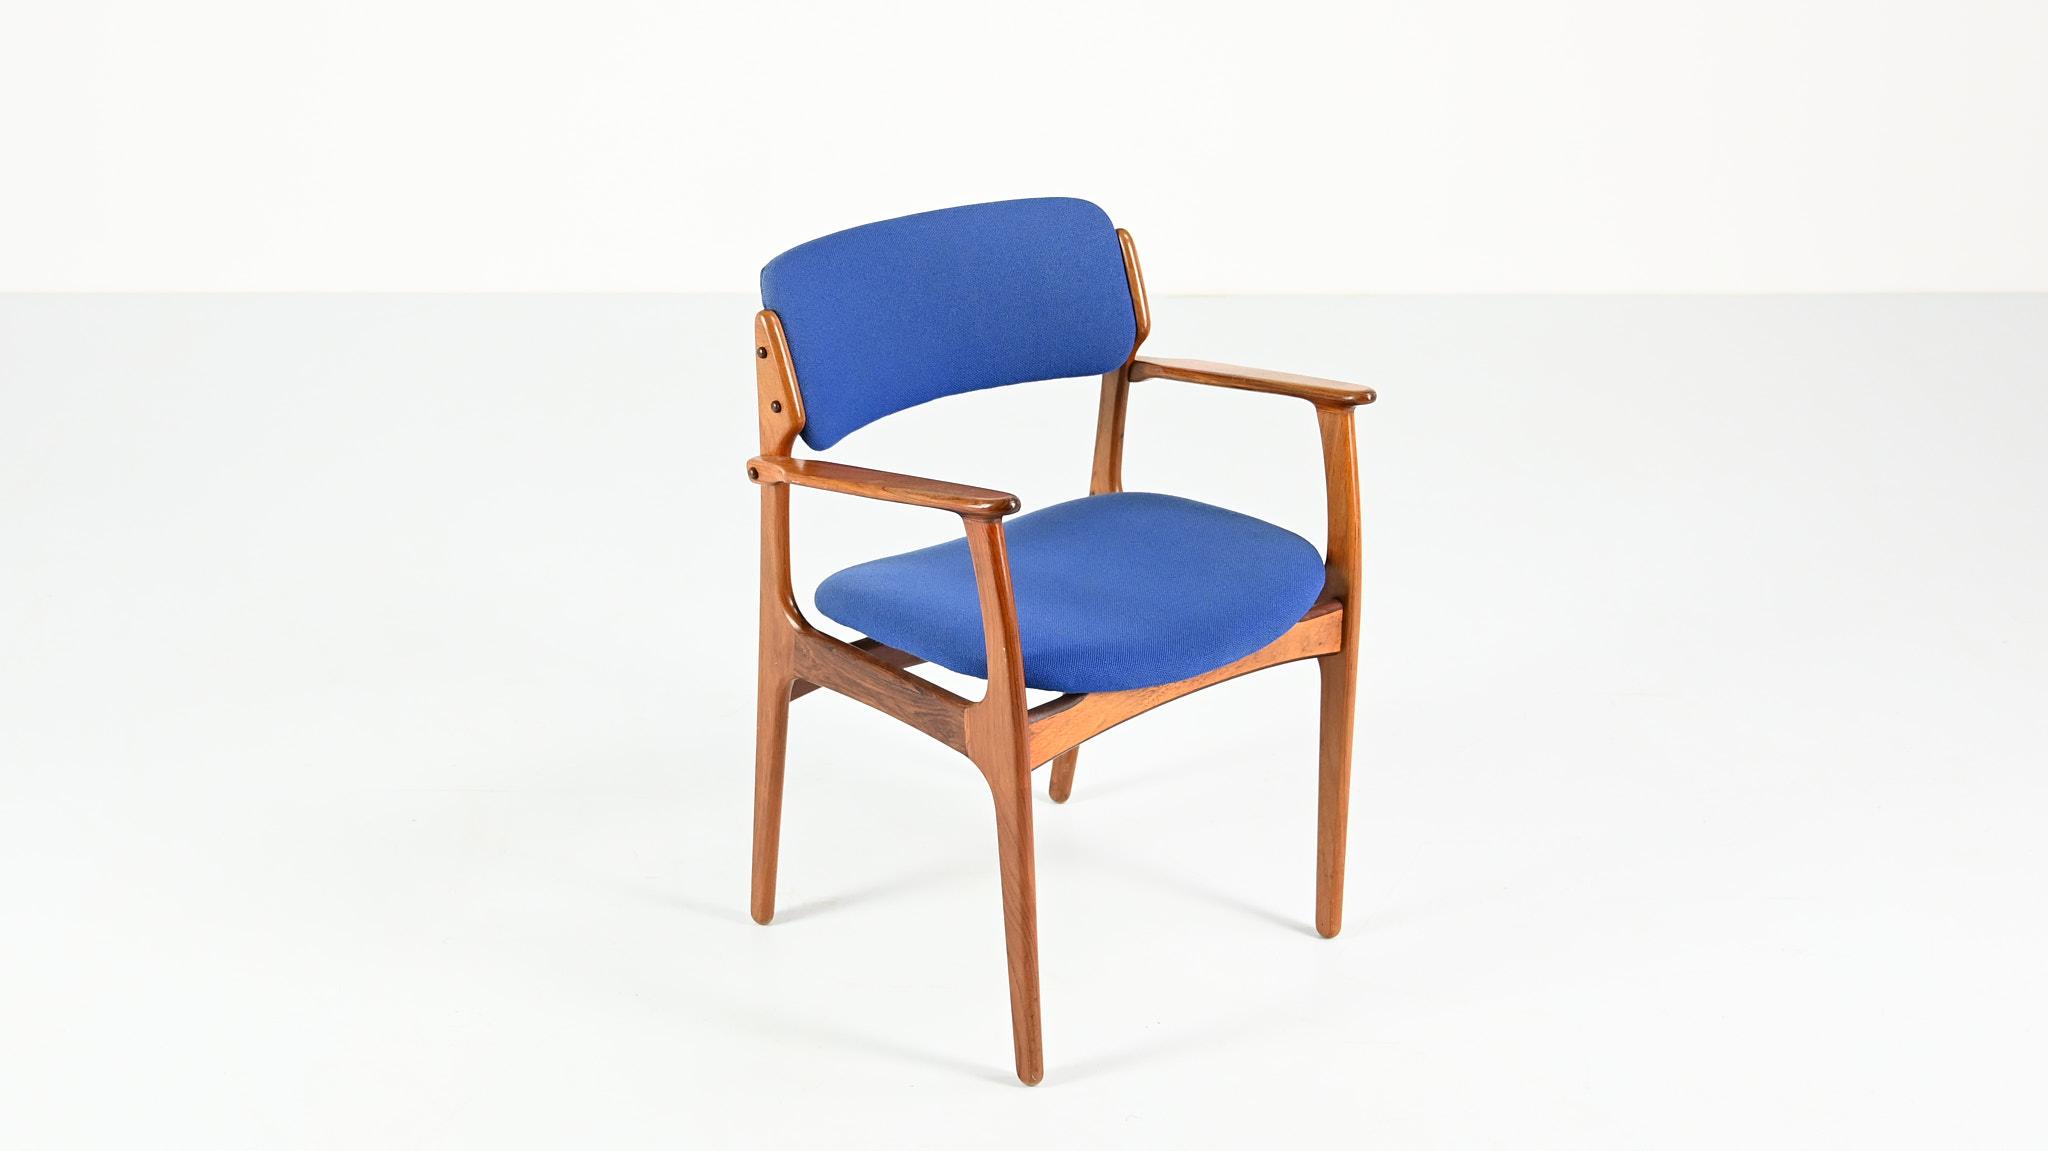 erik buch od mobler odense maskinsnedkeri model 49 armchair fauteuil chaise chaise danish design vintage retro